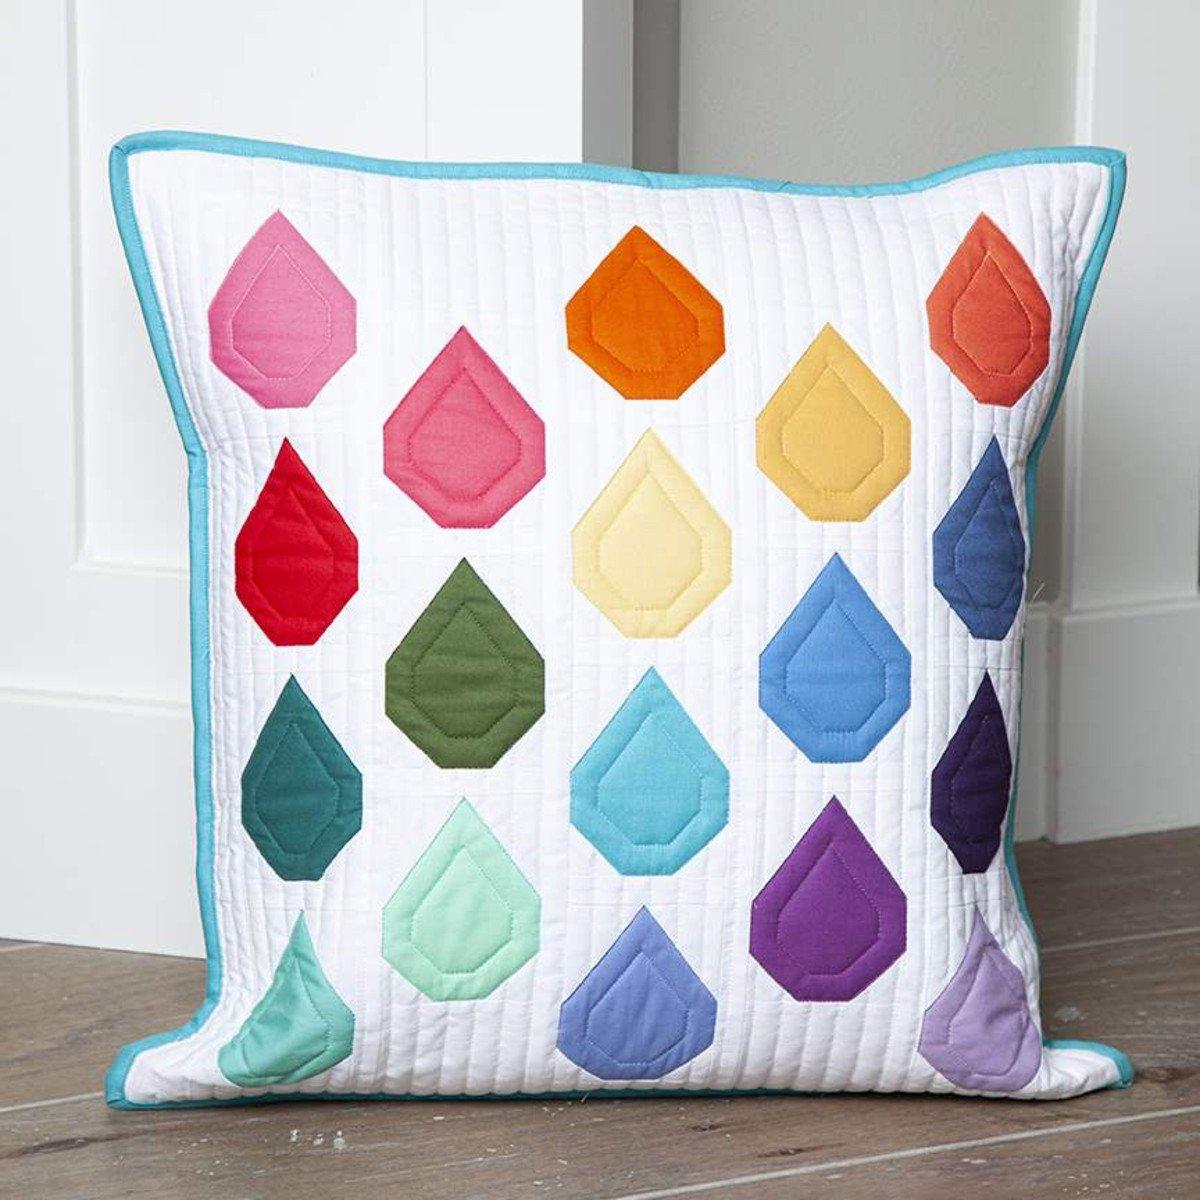 Pillow Kit of the Month 2021 - January (April Pillow)